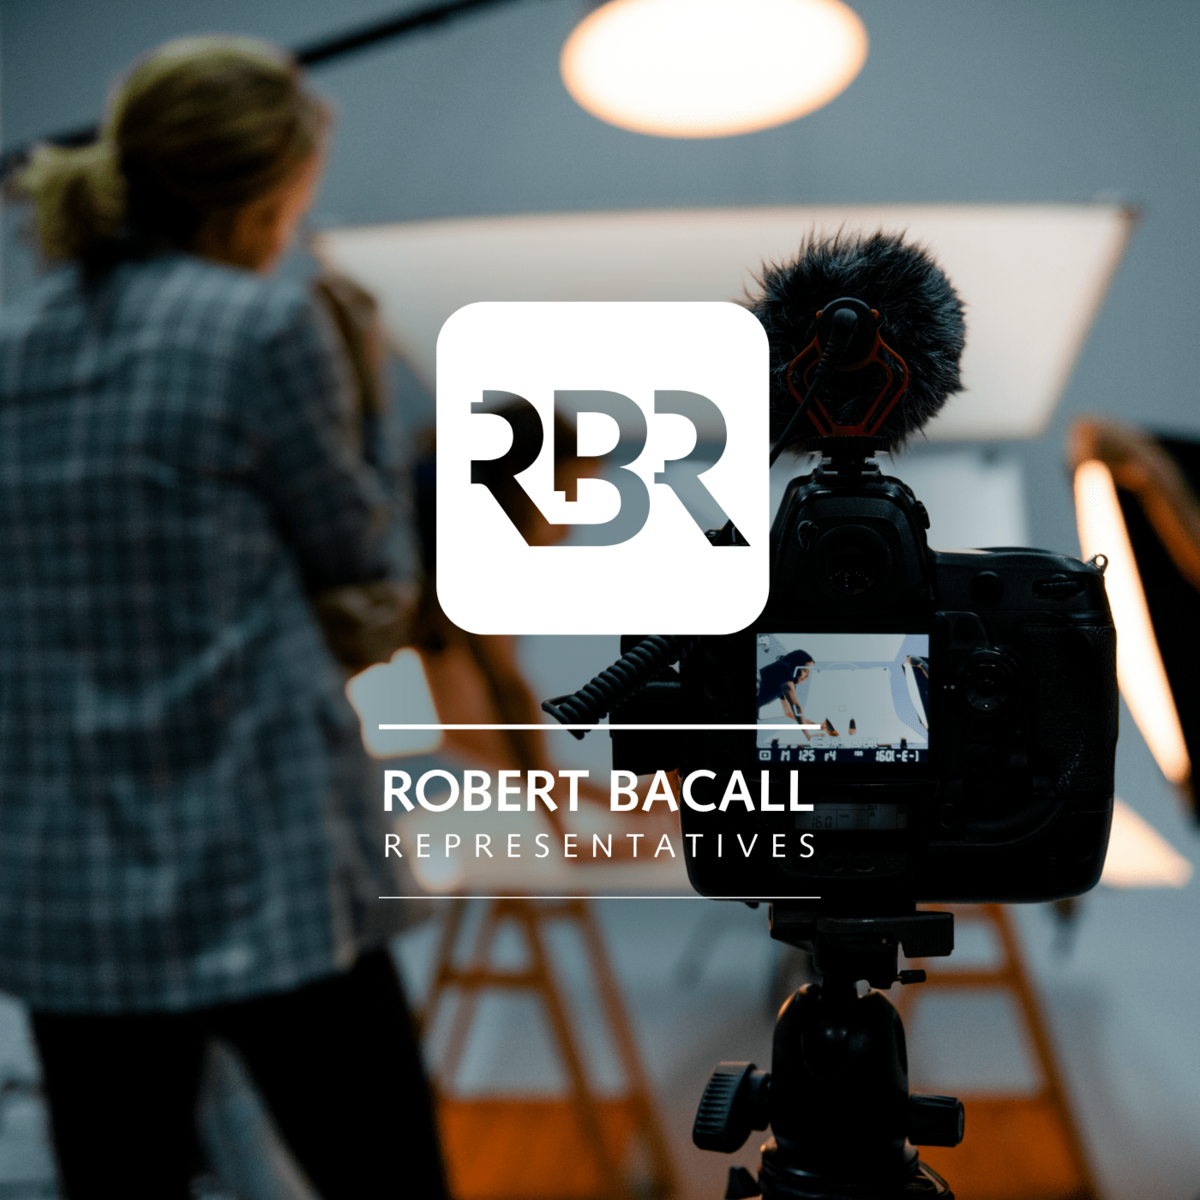 Robert Bacall Representatives